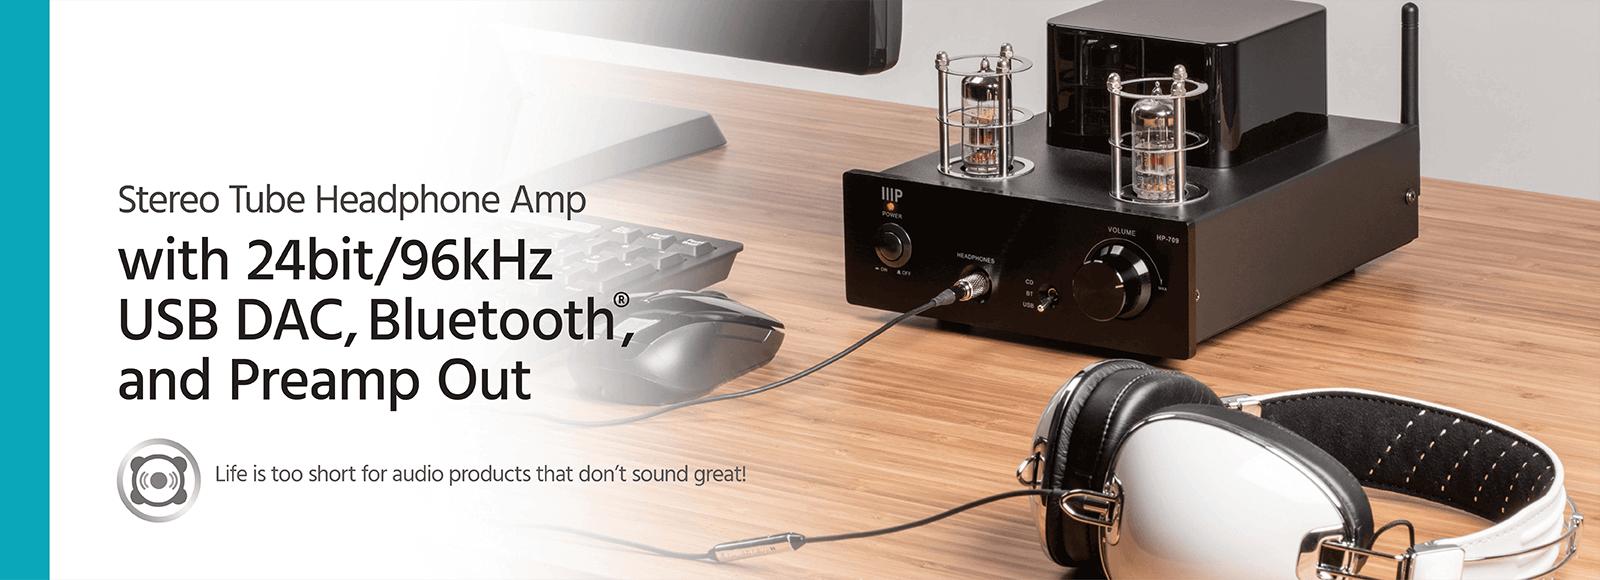 Stereo Tube Headphone Amp